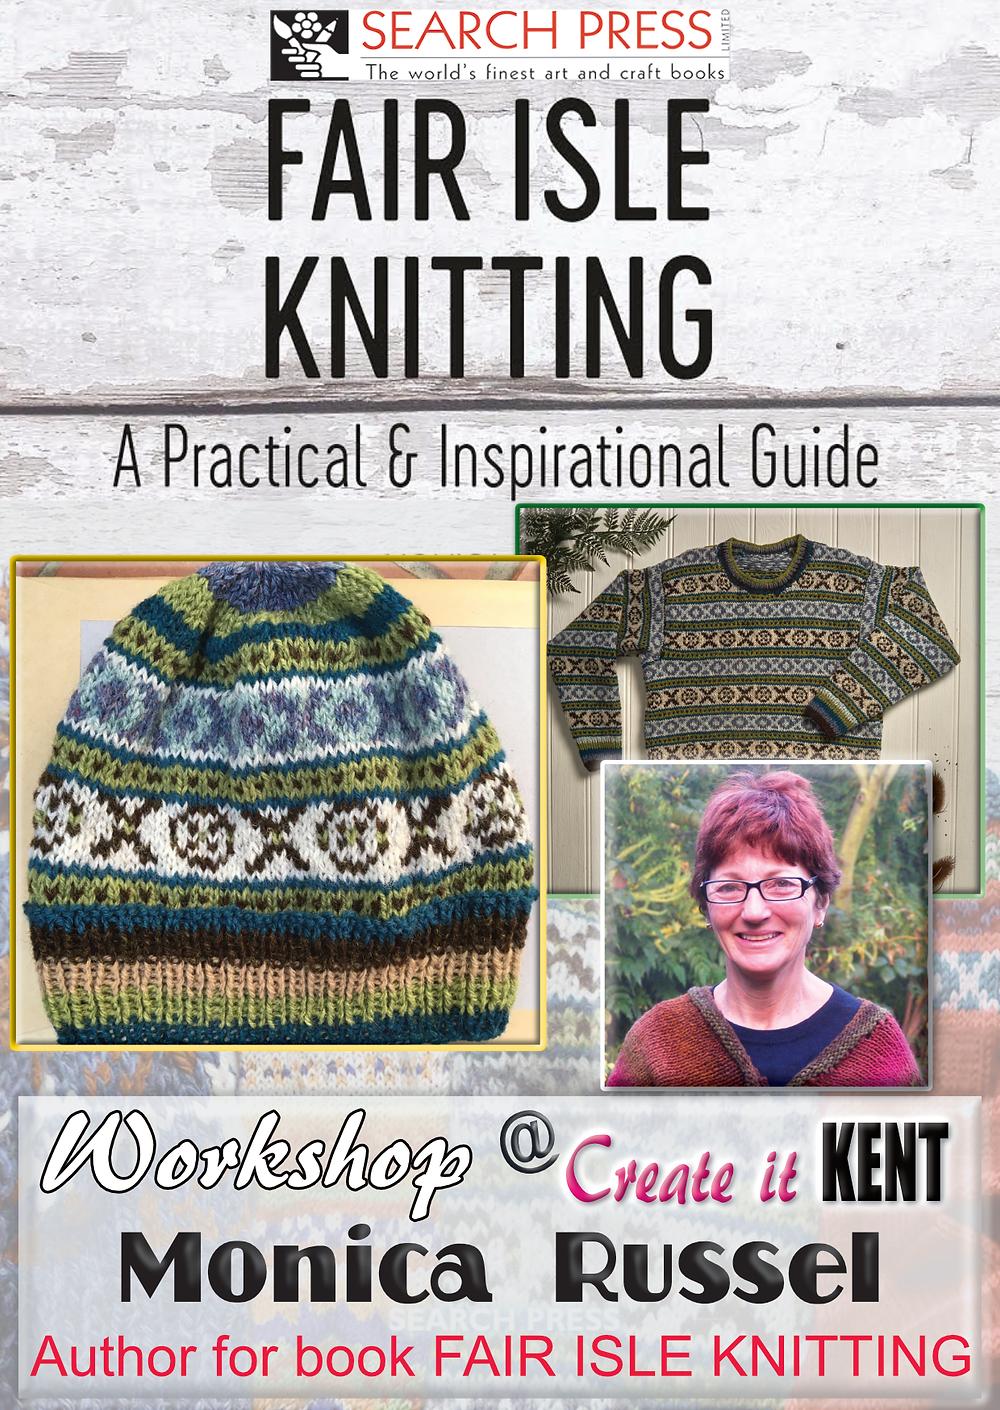 Fair Isle Knitting at Create it Kent